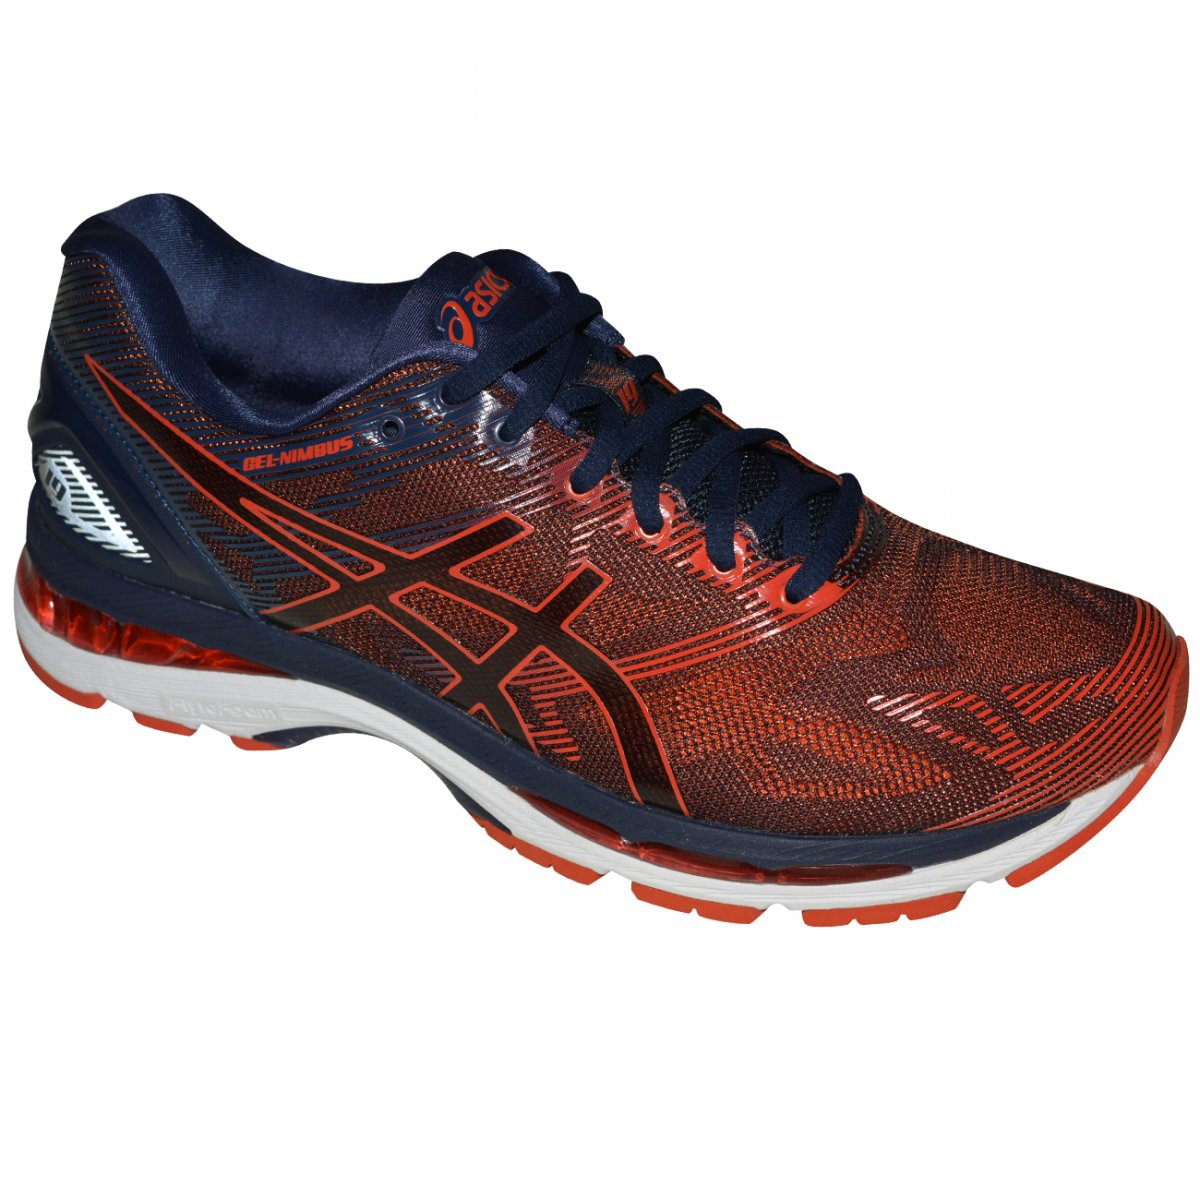 Tenis Asics Gel-nimbus 19 T700N 5806 - Vermelho marinho - Chuteira Nike 40dc3a2e315db